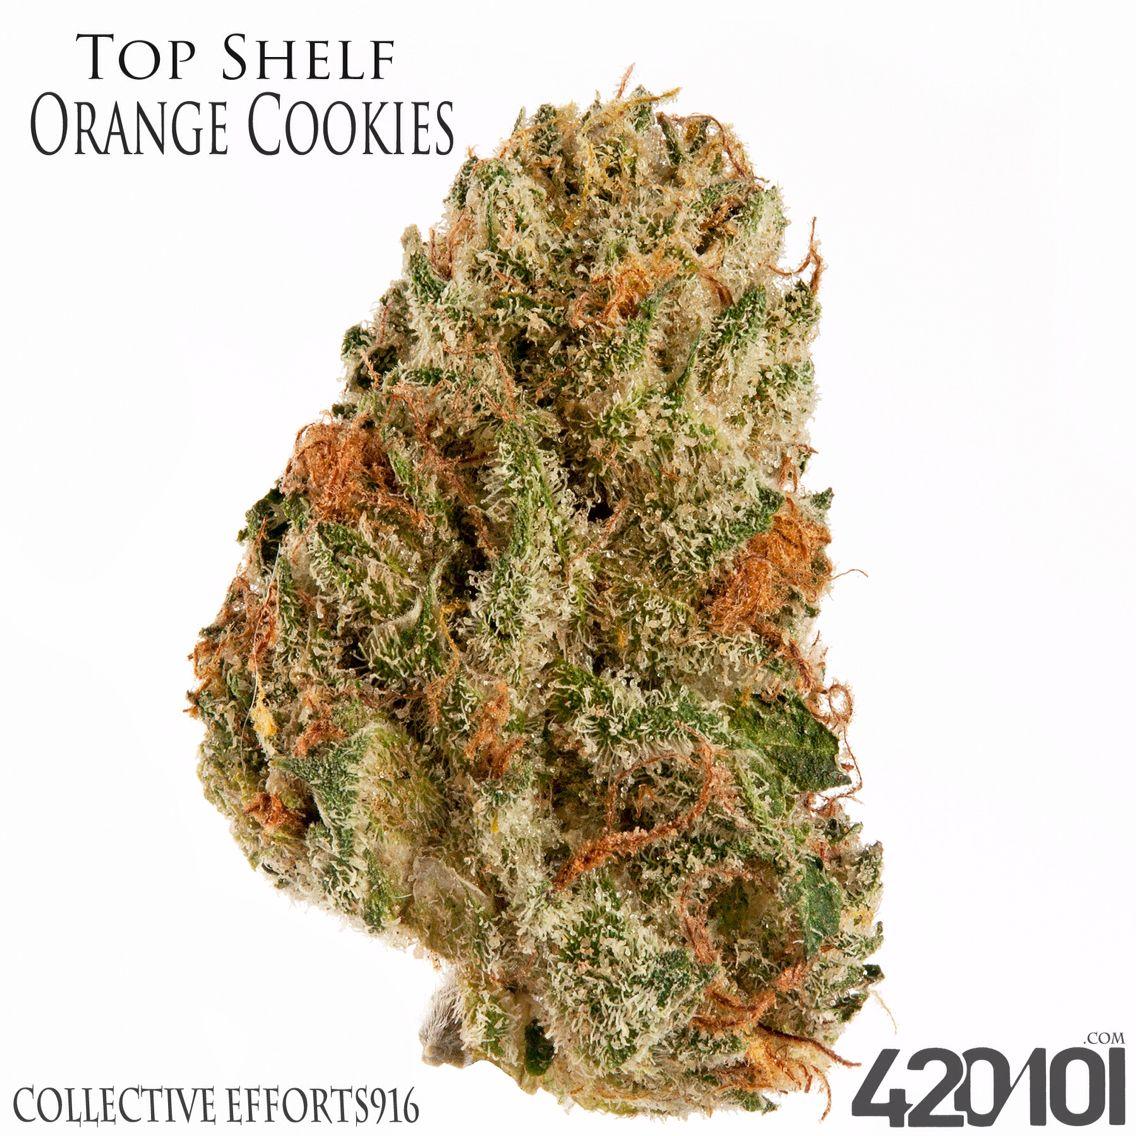 Top Shelf Orange Cookies From Collective Efforts In Sacramento